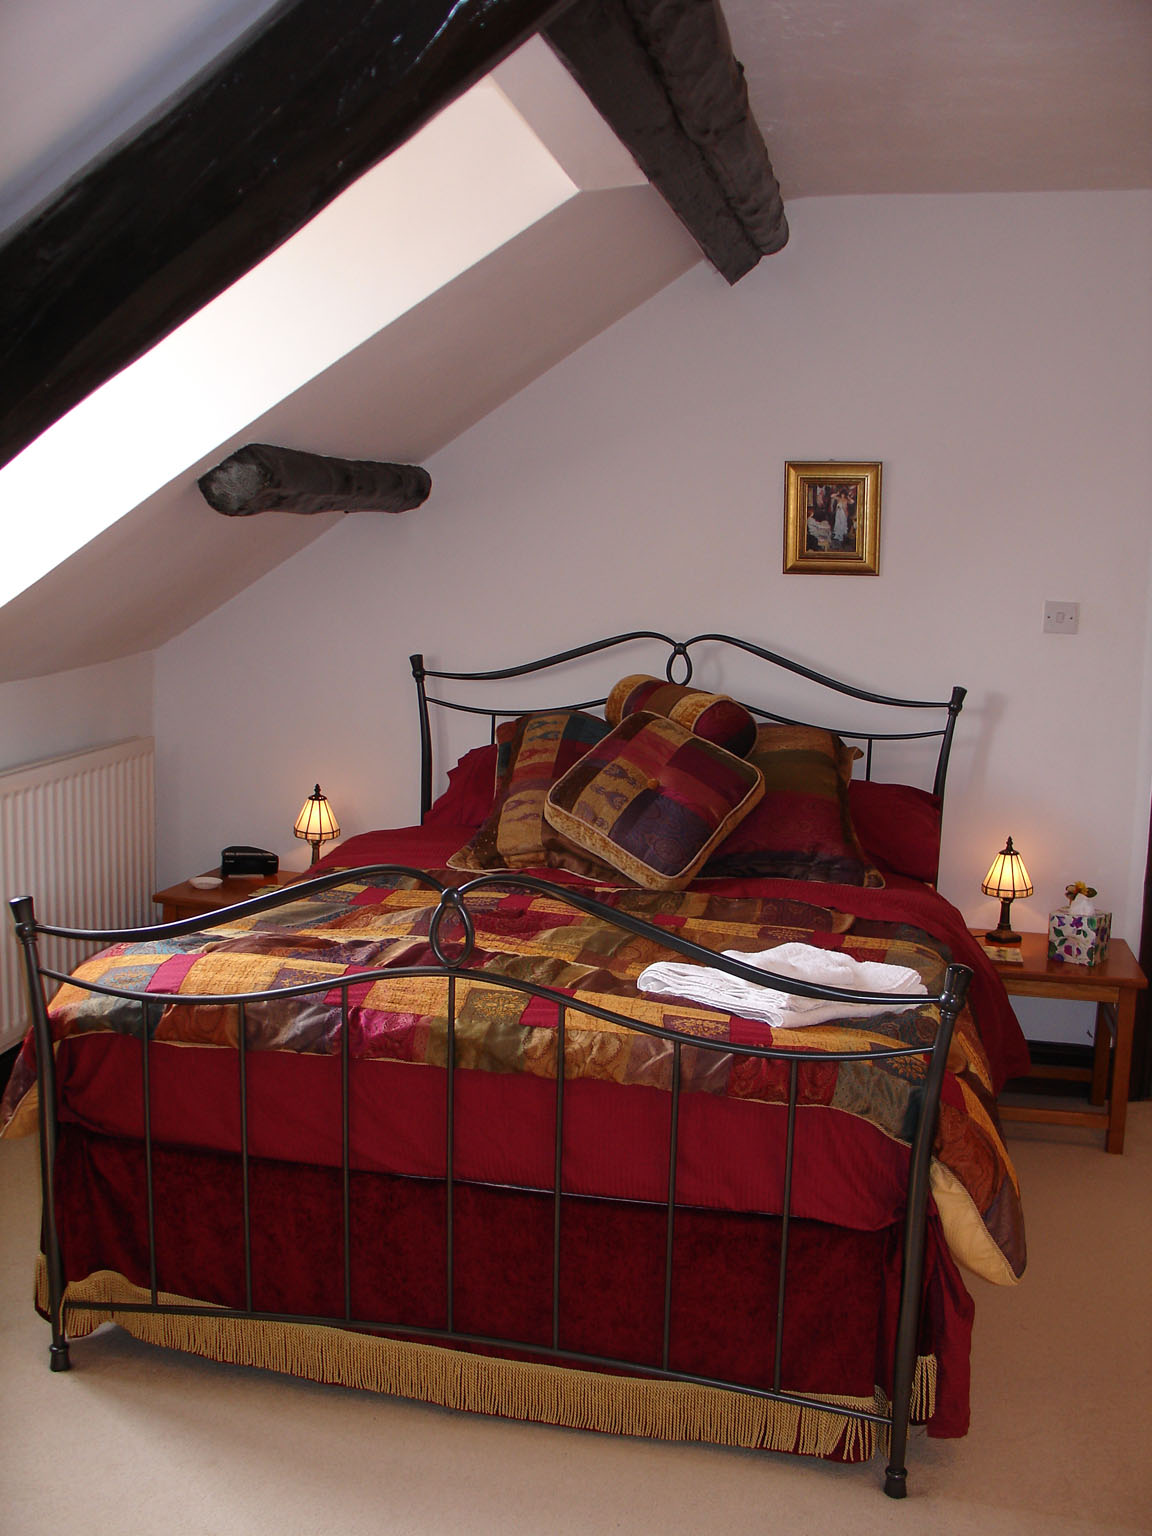 Castleview apartment 2011 001